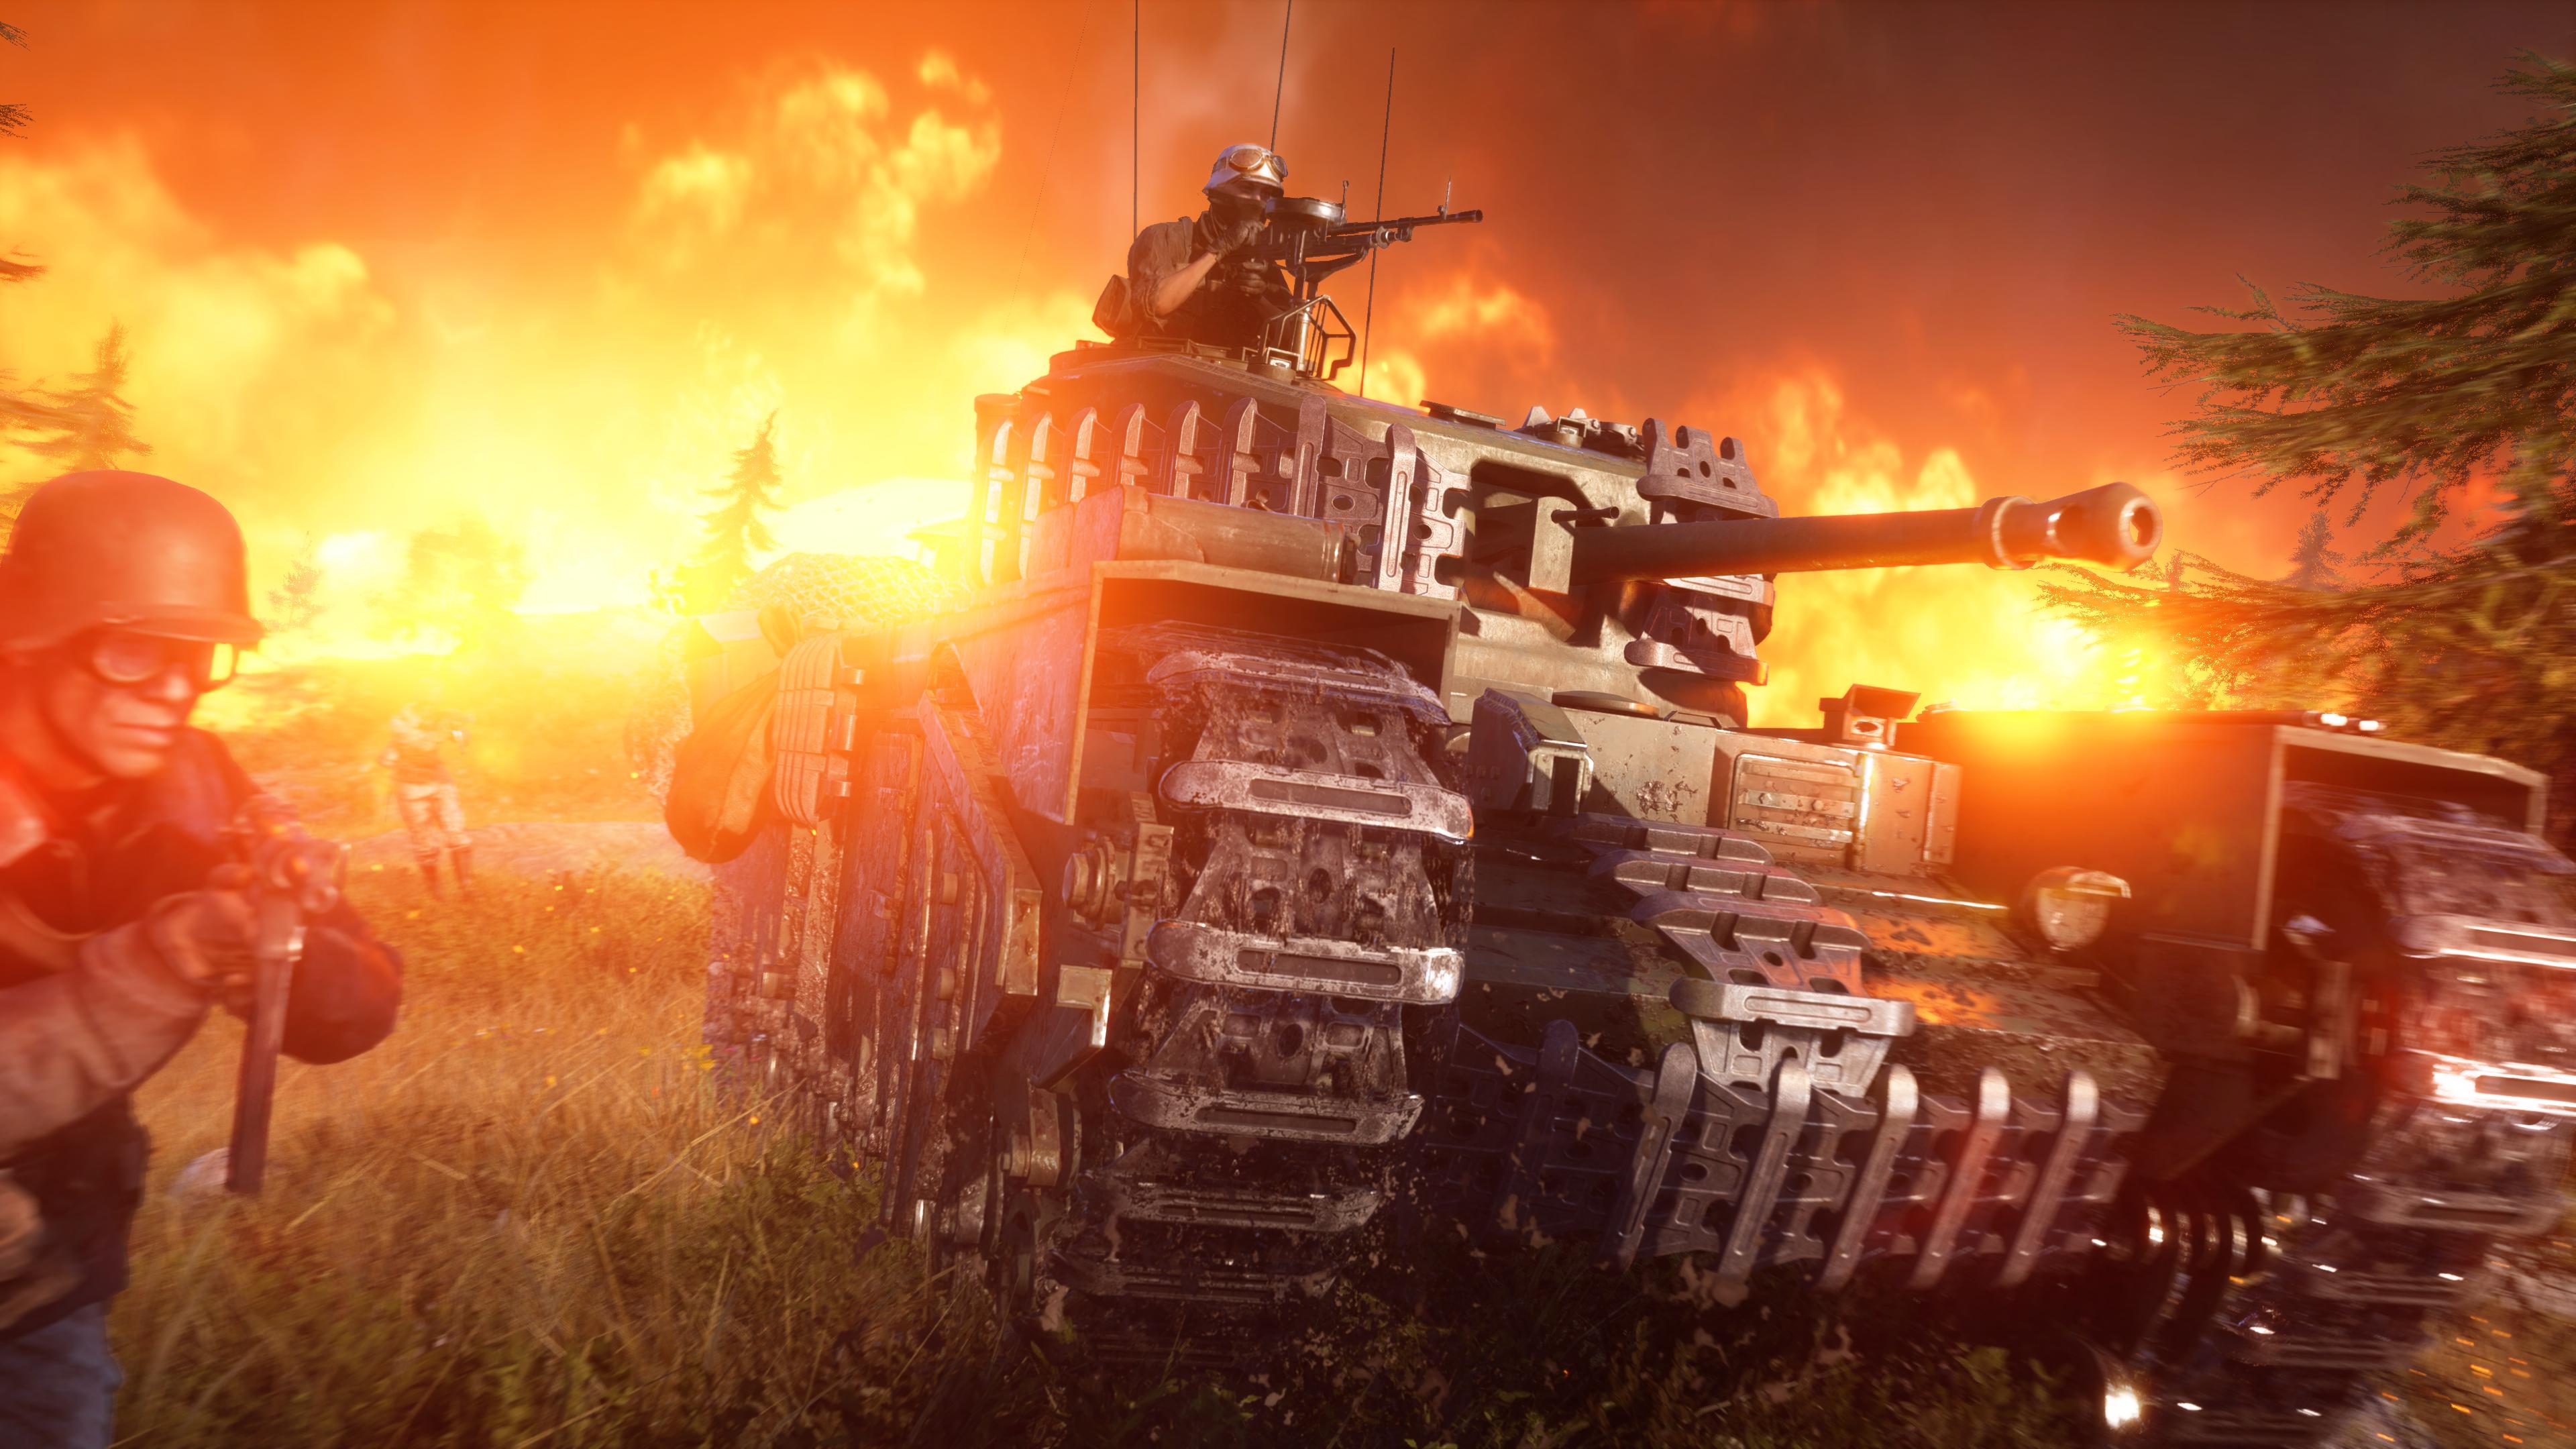 Battlefield V Clean Wallpaper 4k - Battlefield 5 Wallpaper 4k , HD Wallpaper & Backgrounds